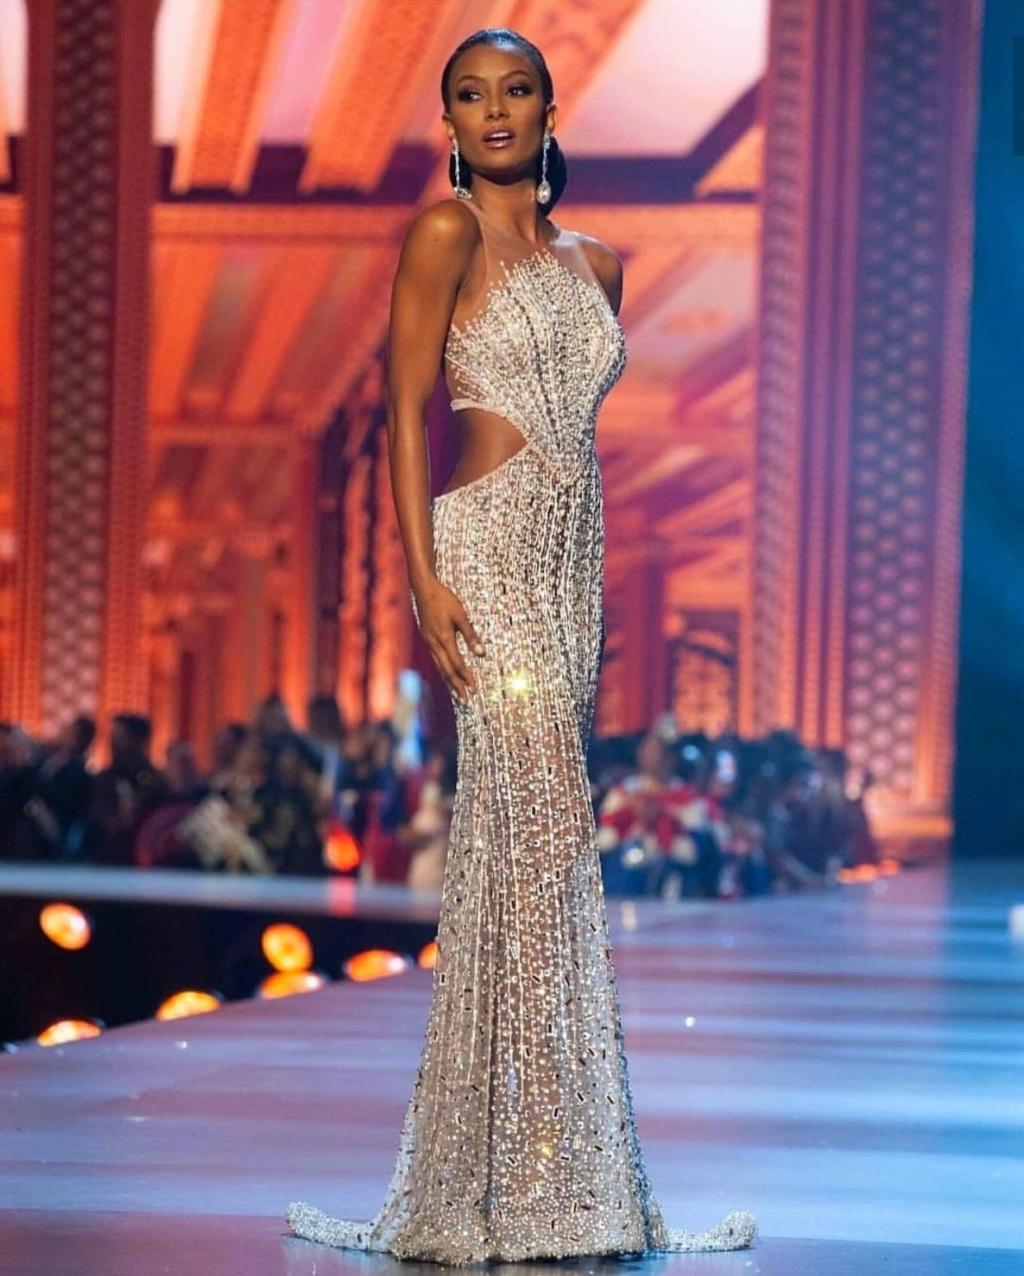 Road to Miss Universe Curacao 2019 is Kyrsha Attaf 8e7b7110